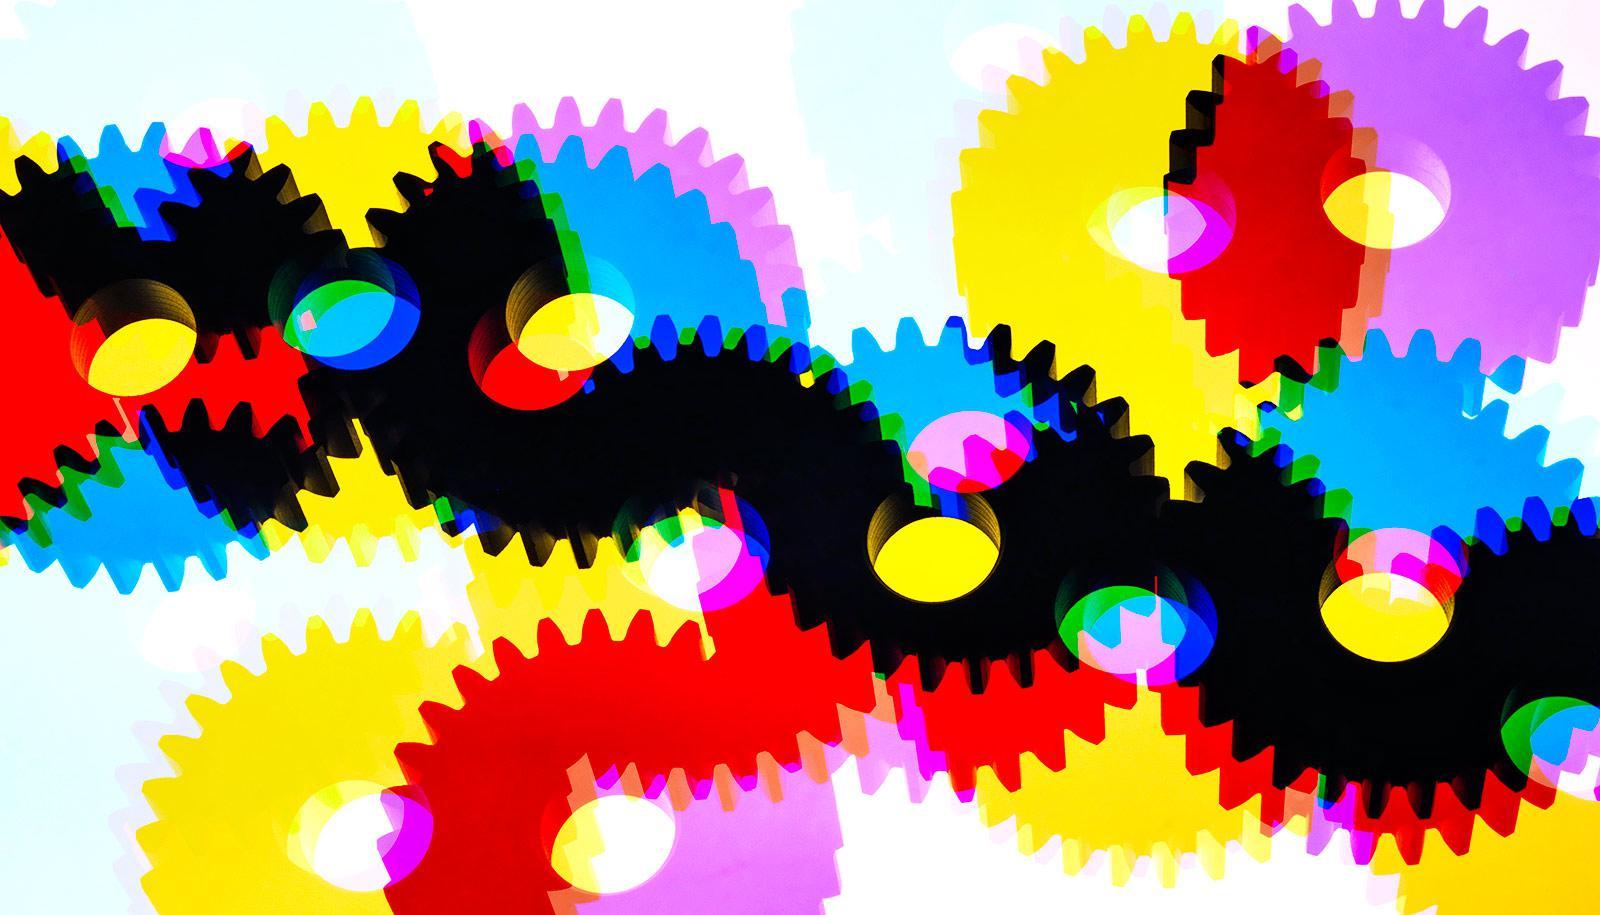 colorful gears (antibiotics concept)